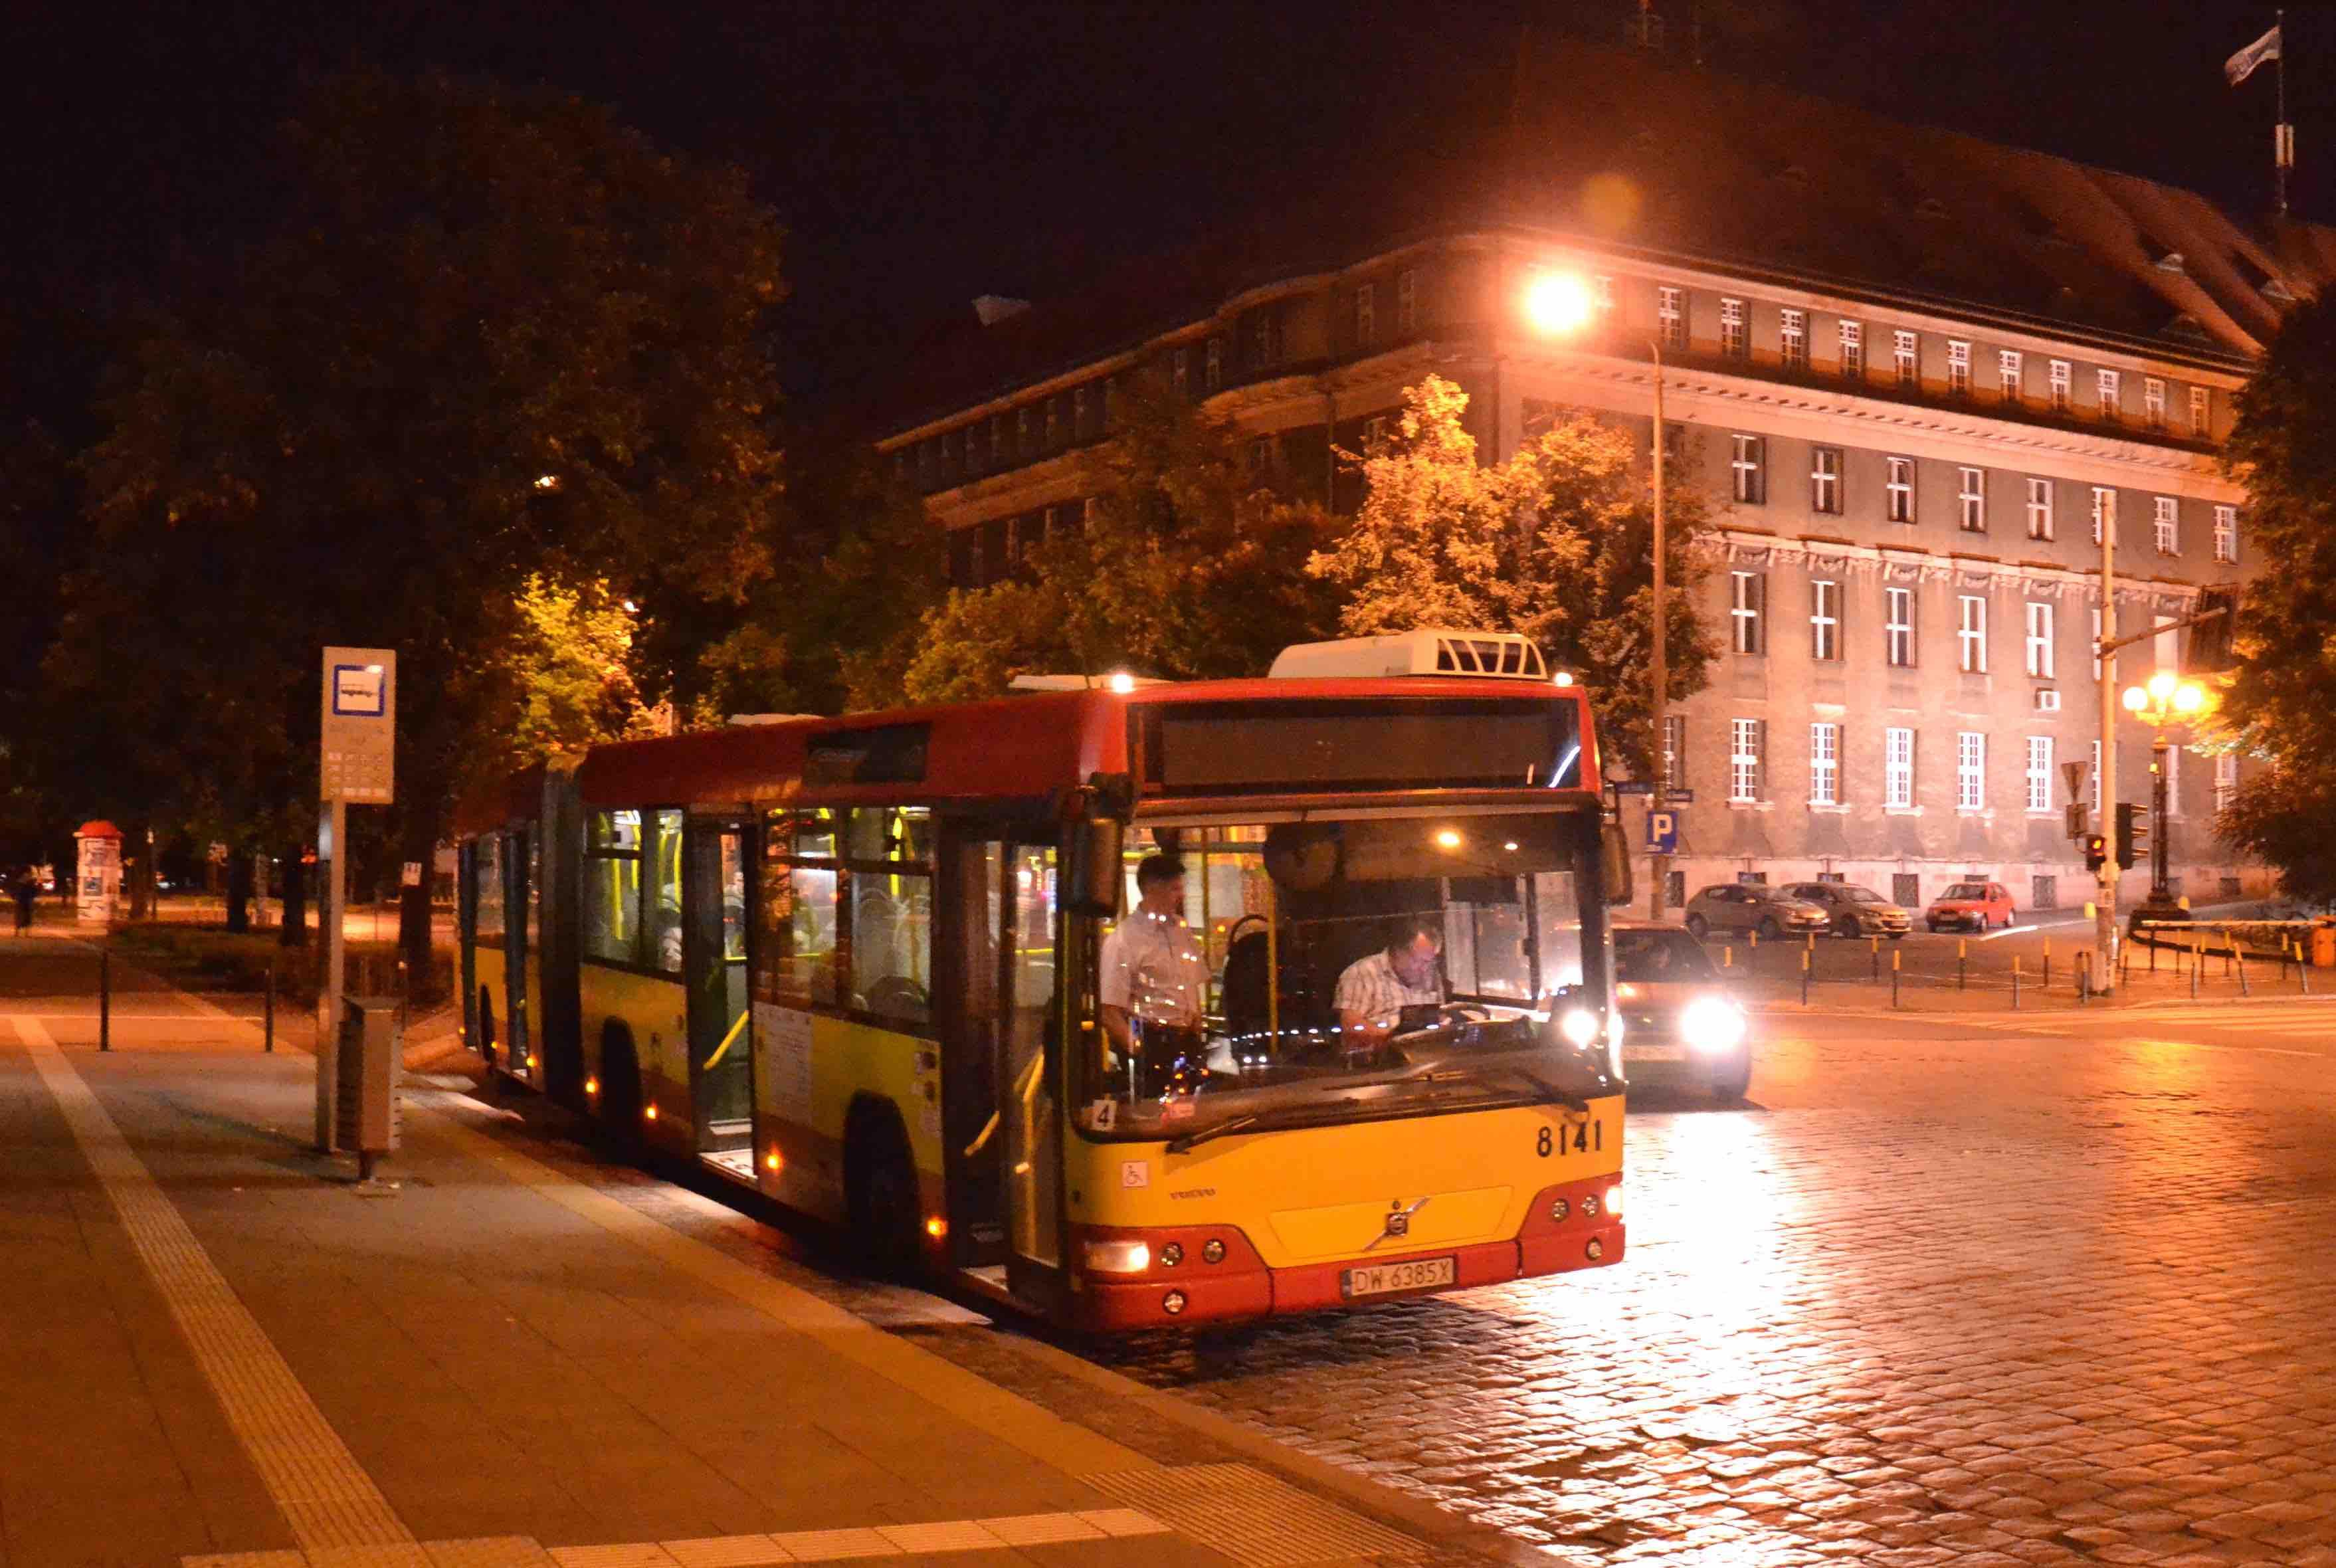 Autobus linea notturna